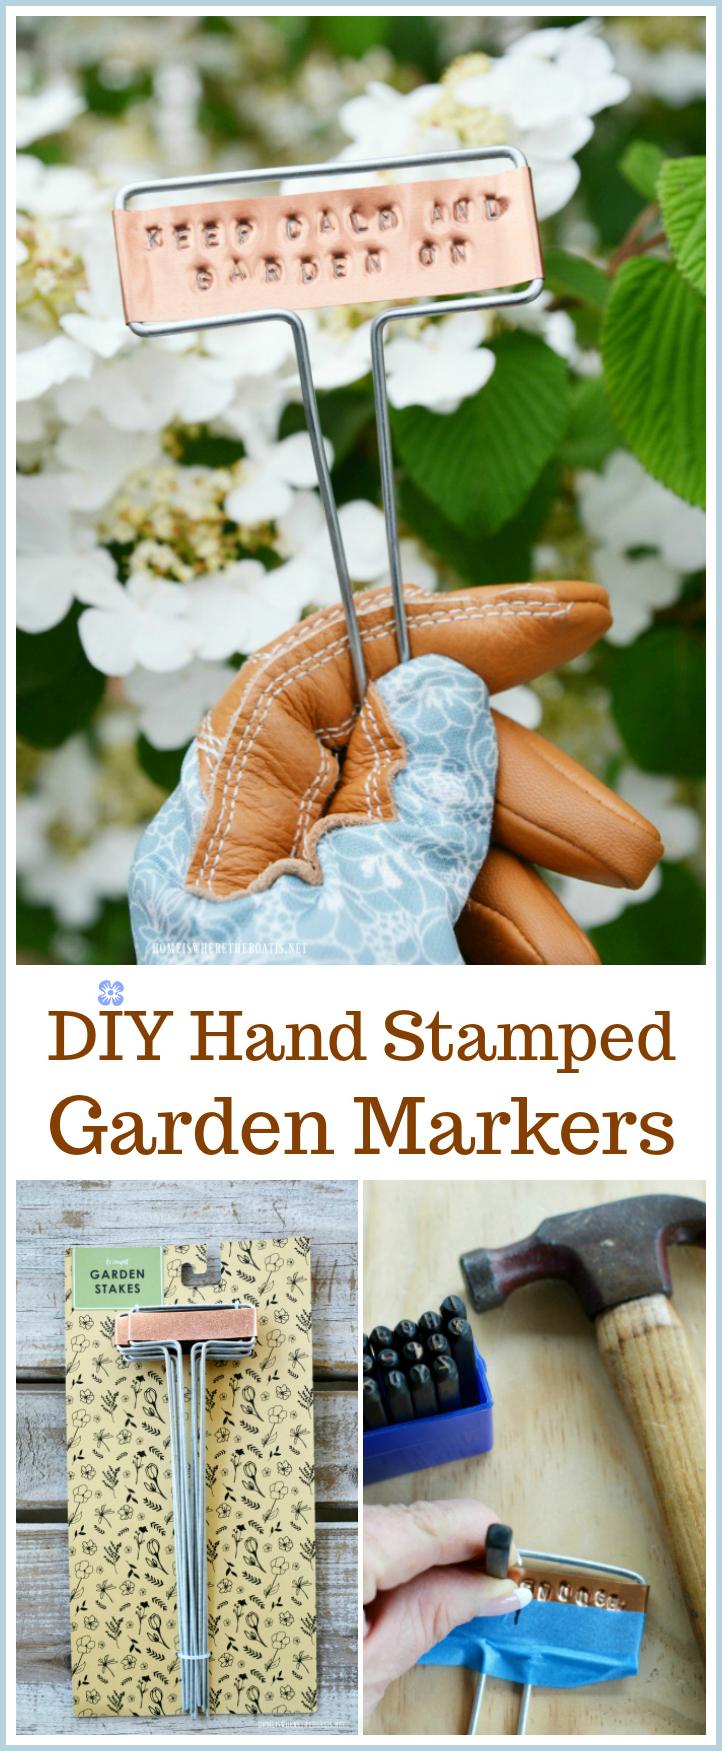 DIY Hand Stamped Copper Garden Markers | ©homeiswheretheboatis.net #garden #spring #DIY